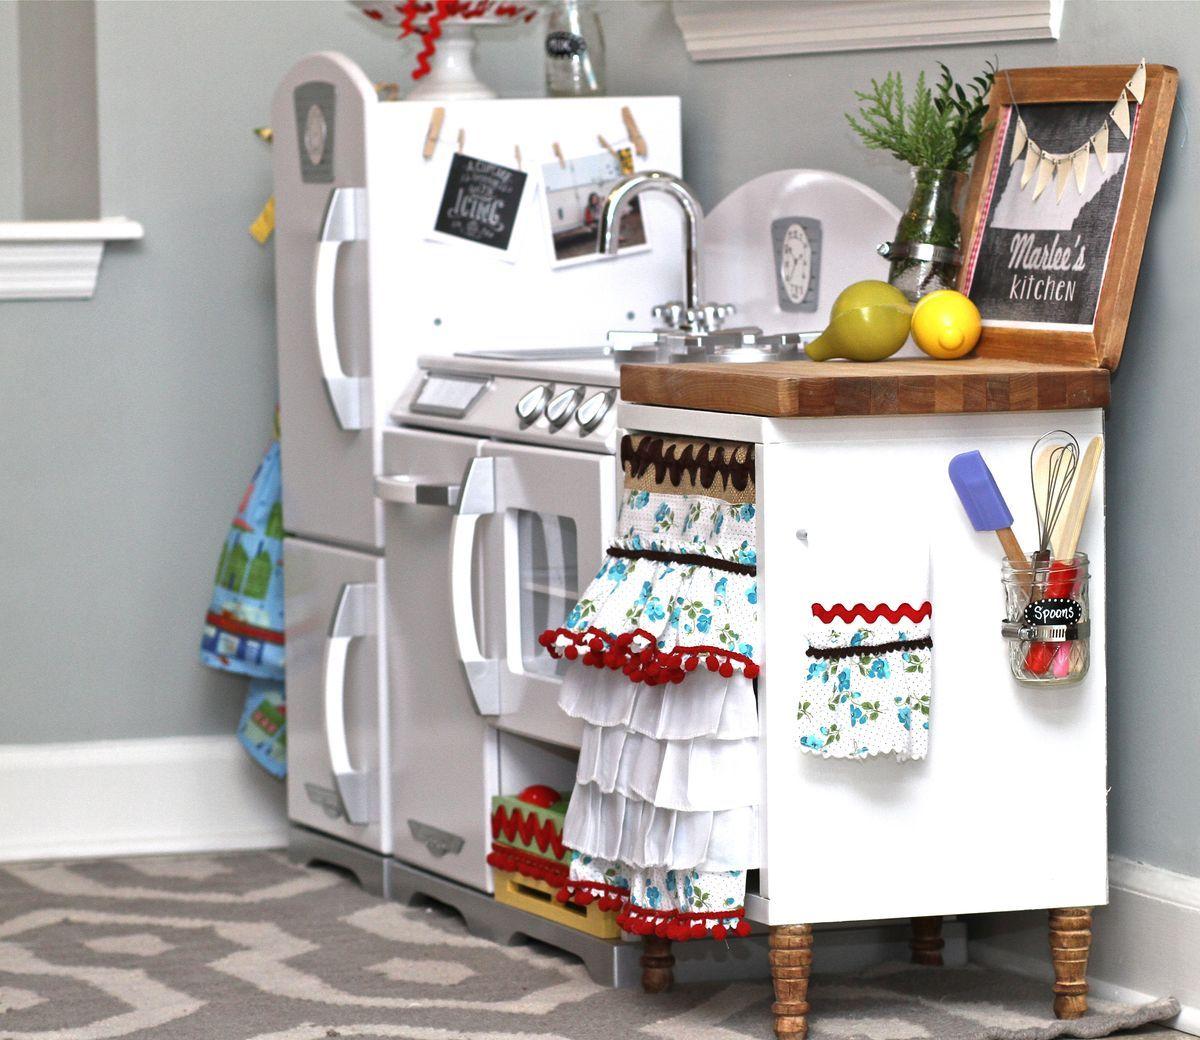 Idea To Add Extra Counter Space To Elz Kitchen Kidkraft Retro Kitchen Diy Play Kitchen Kidkraft Kitchen